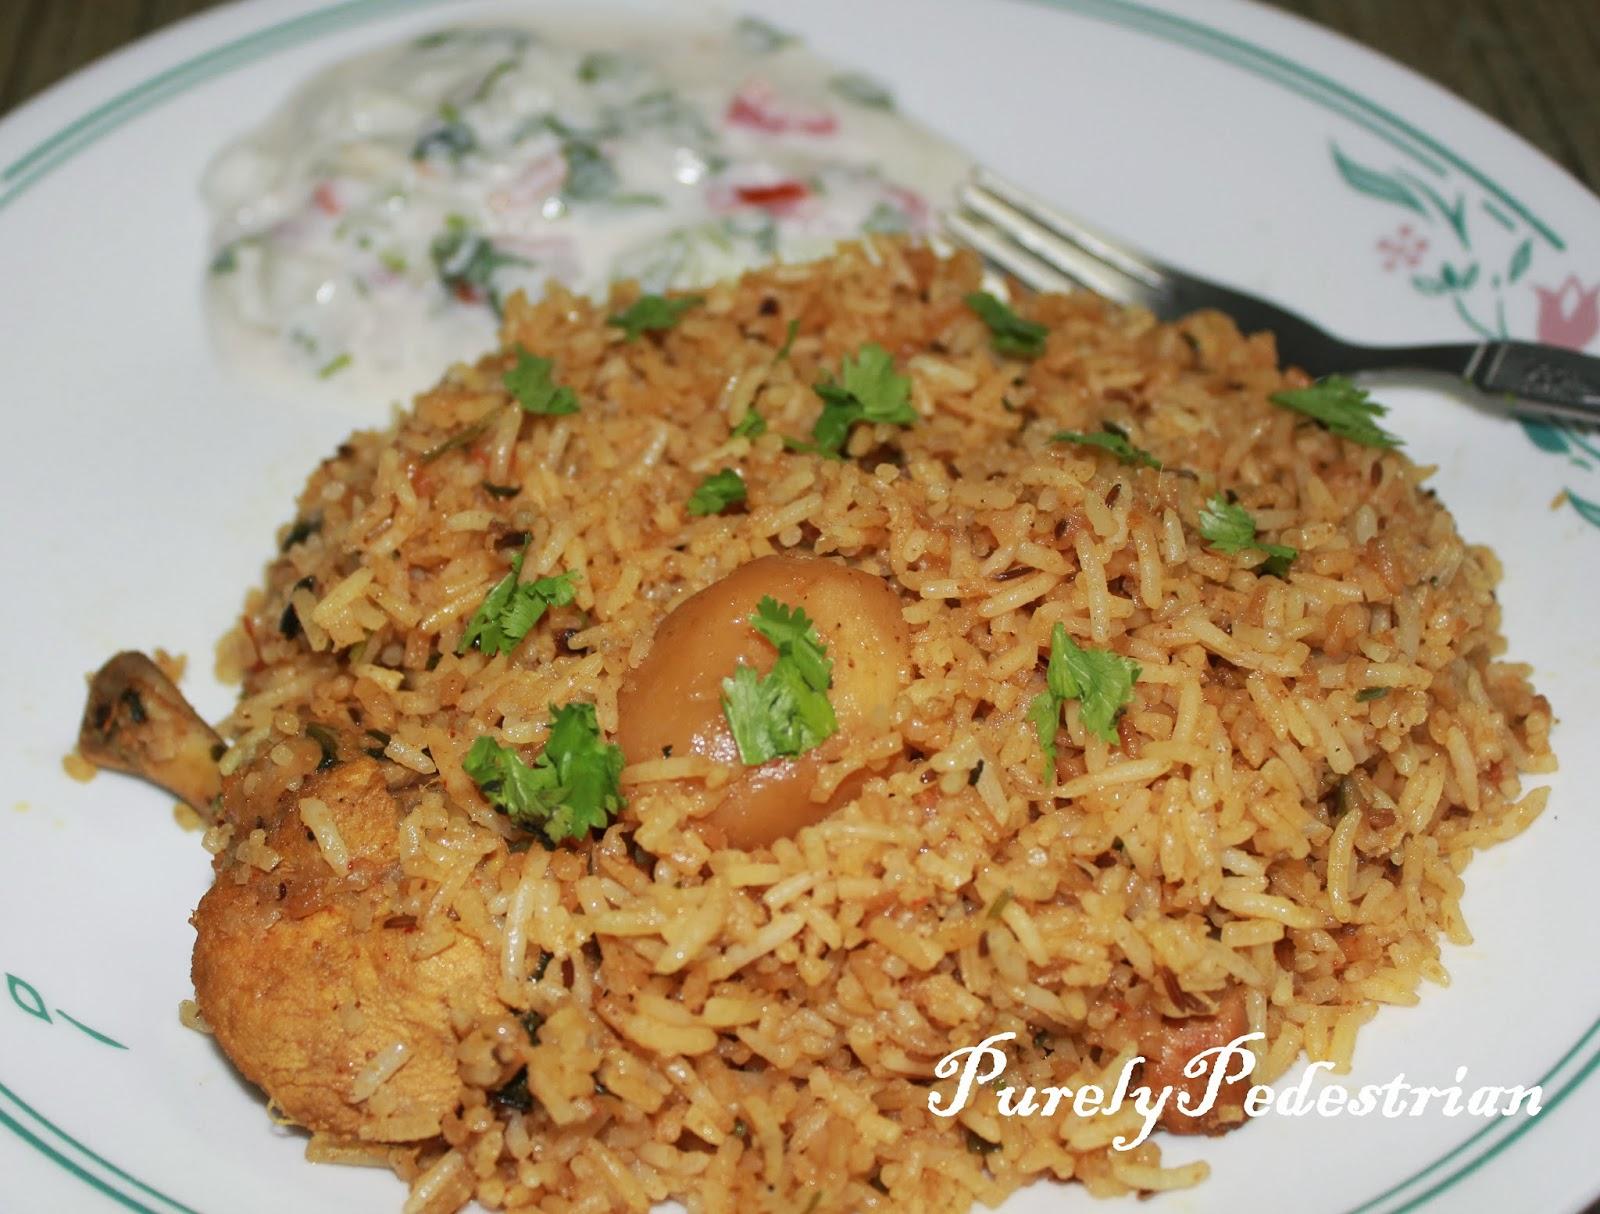 Thalassery Biryani Recipe images